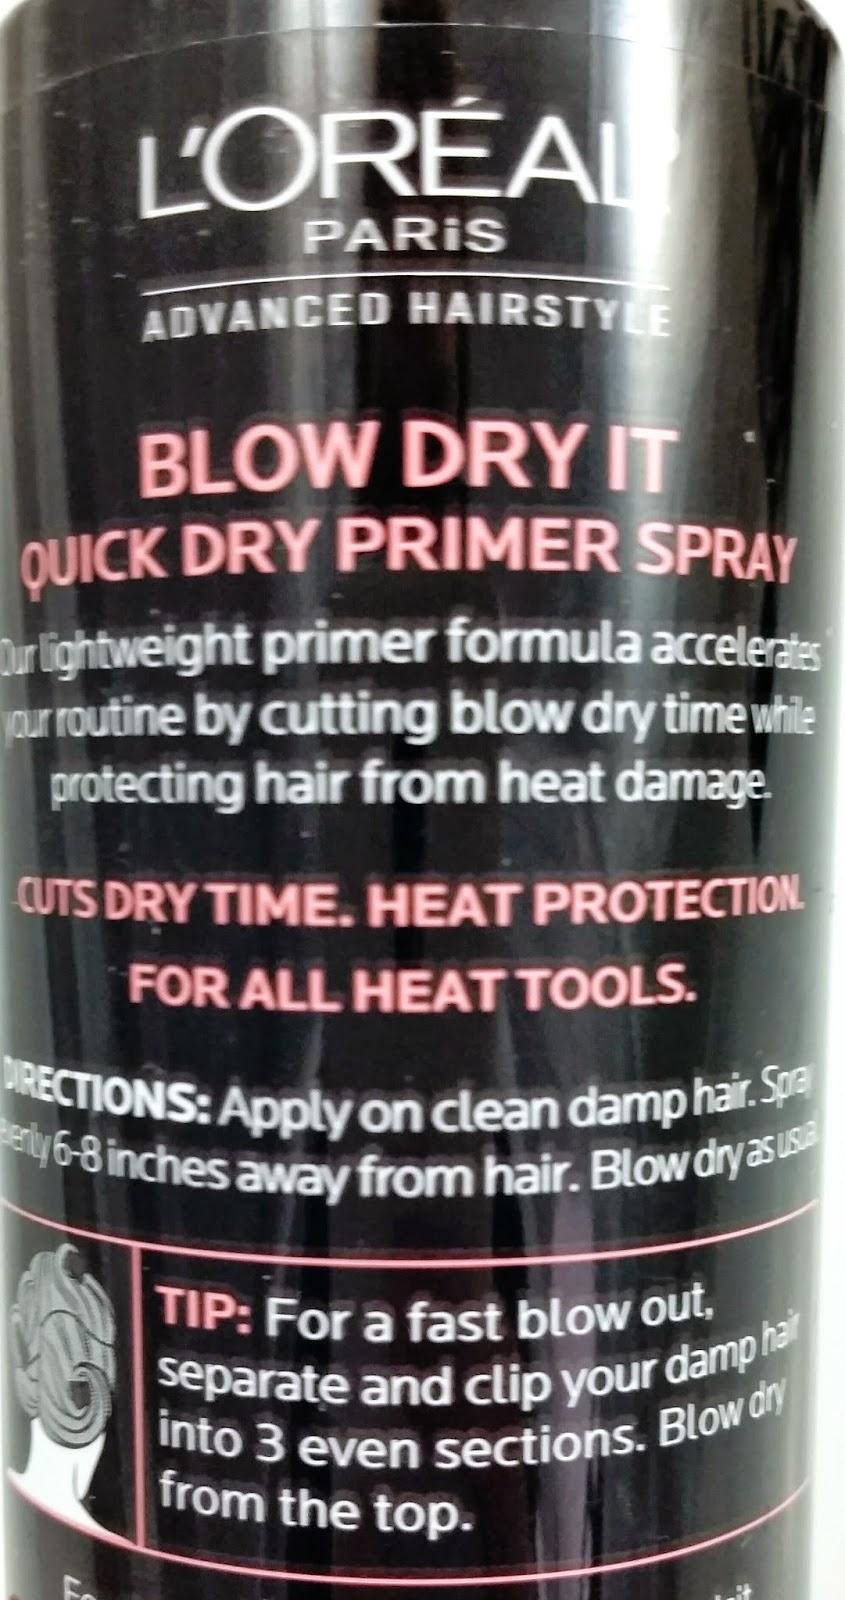 blow dry it quick dry primer spray